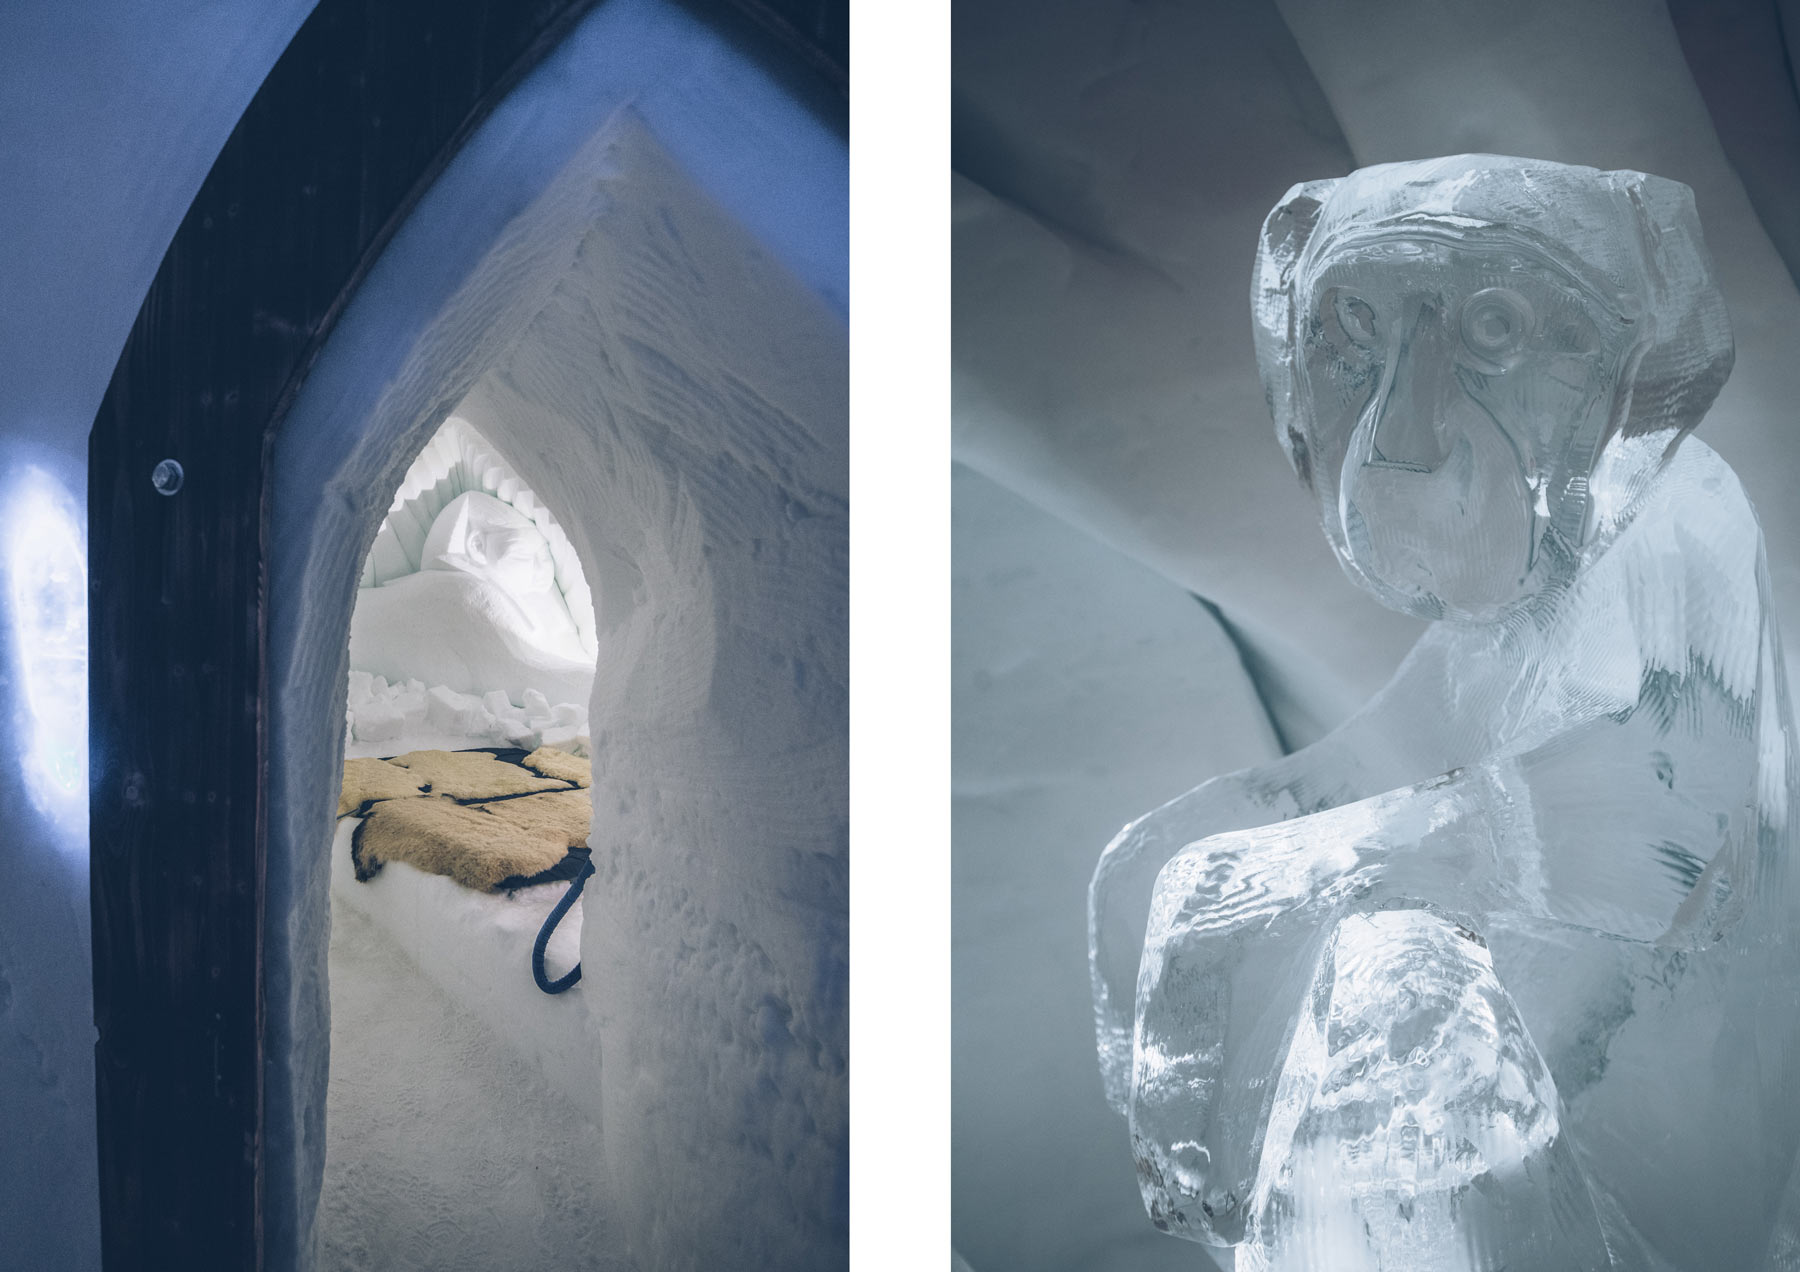 Dormir dans un igloo en Suisse: Davos